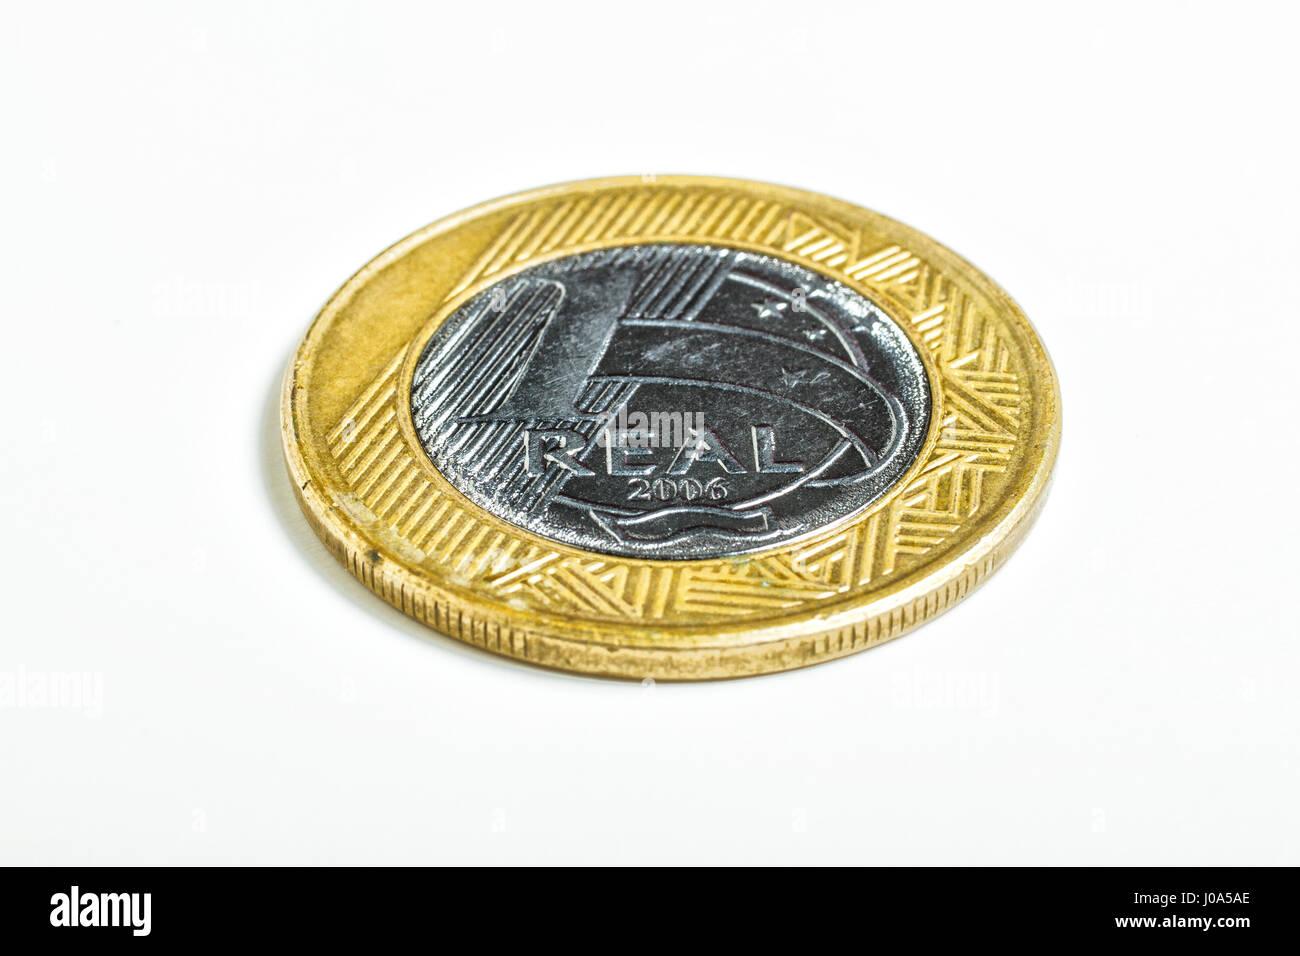 Brazilian real coin. - Stock Image